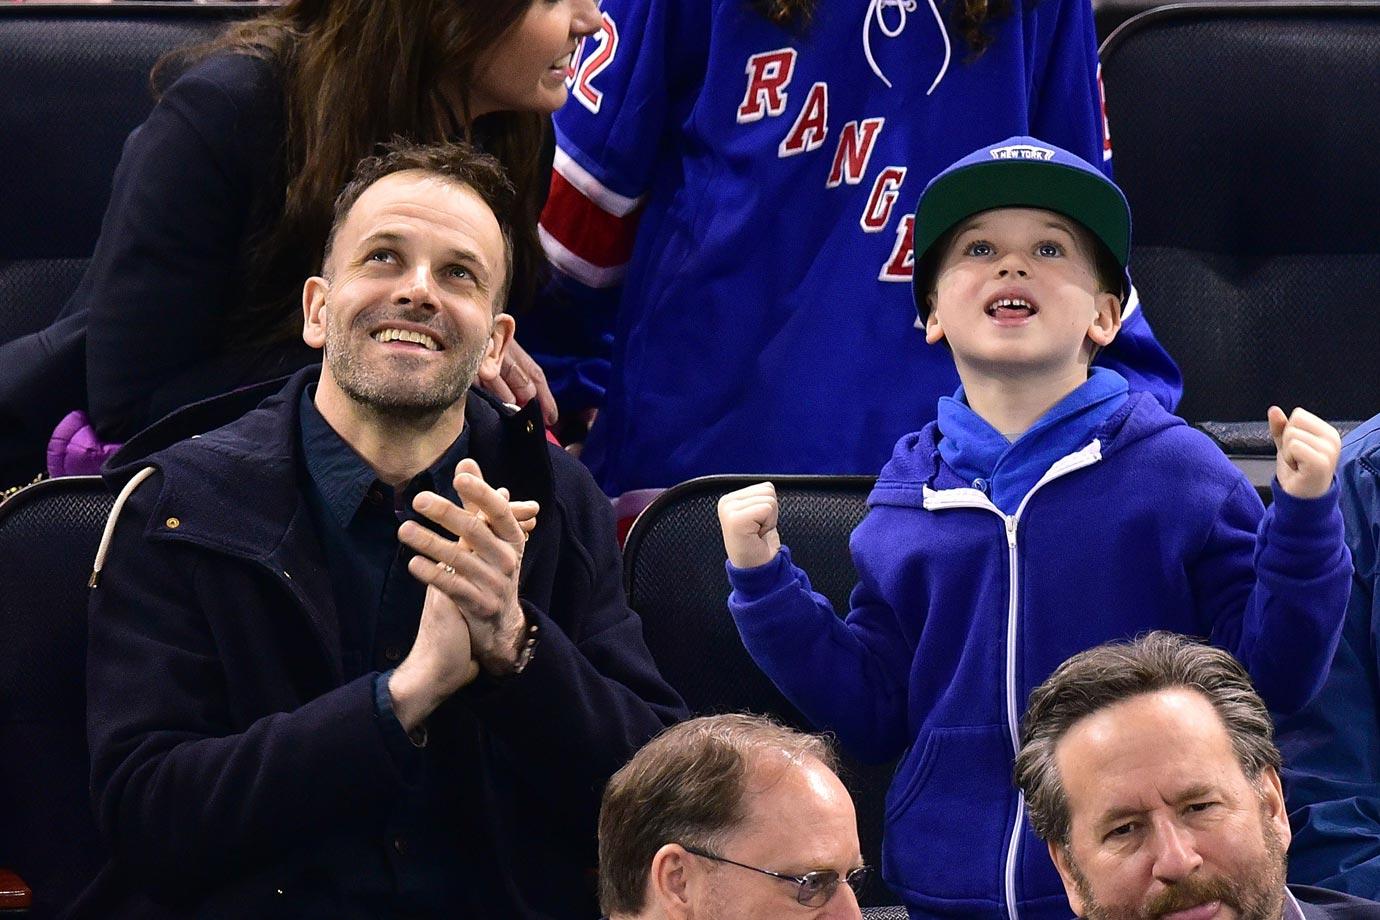 March 29, 2015: New York Rangers vs. Washington Capitals at Madison Square Garden in New York City